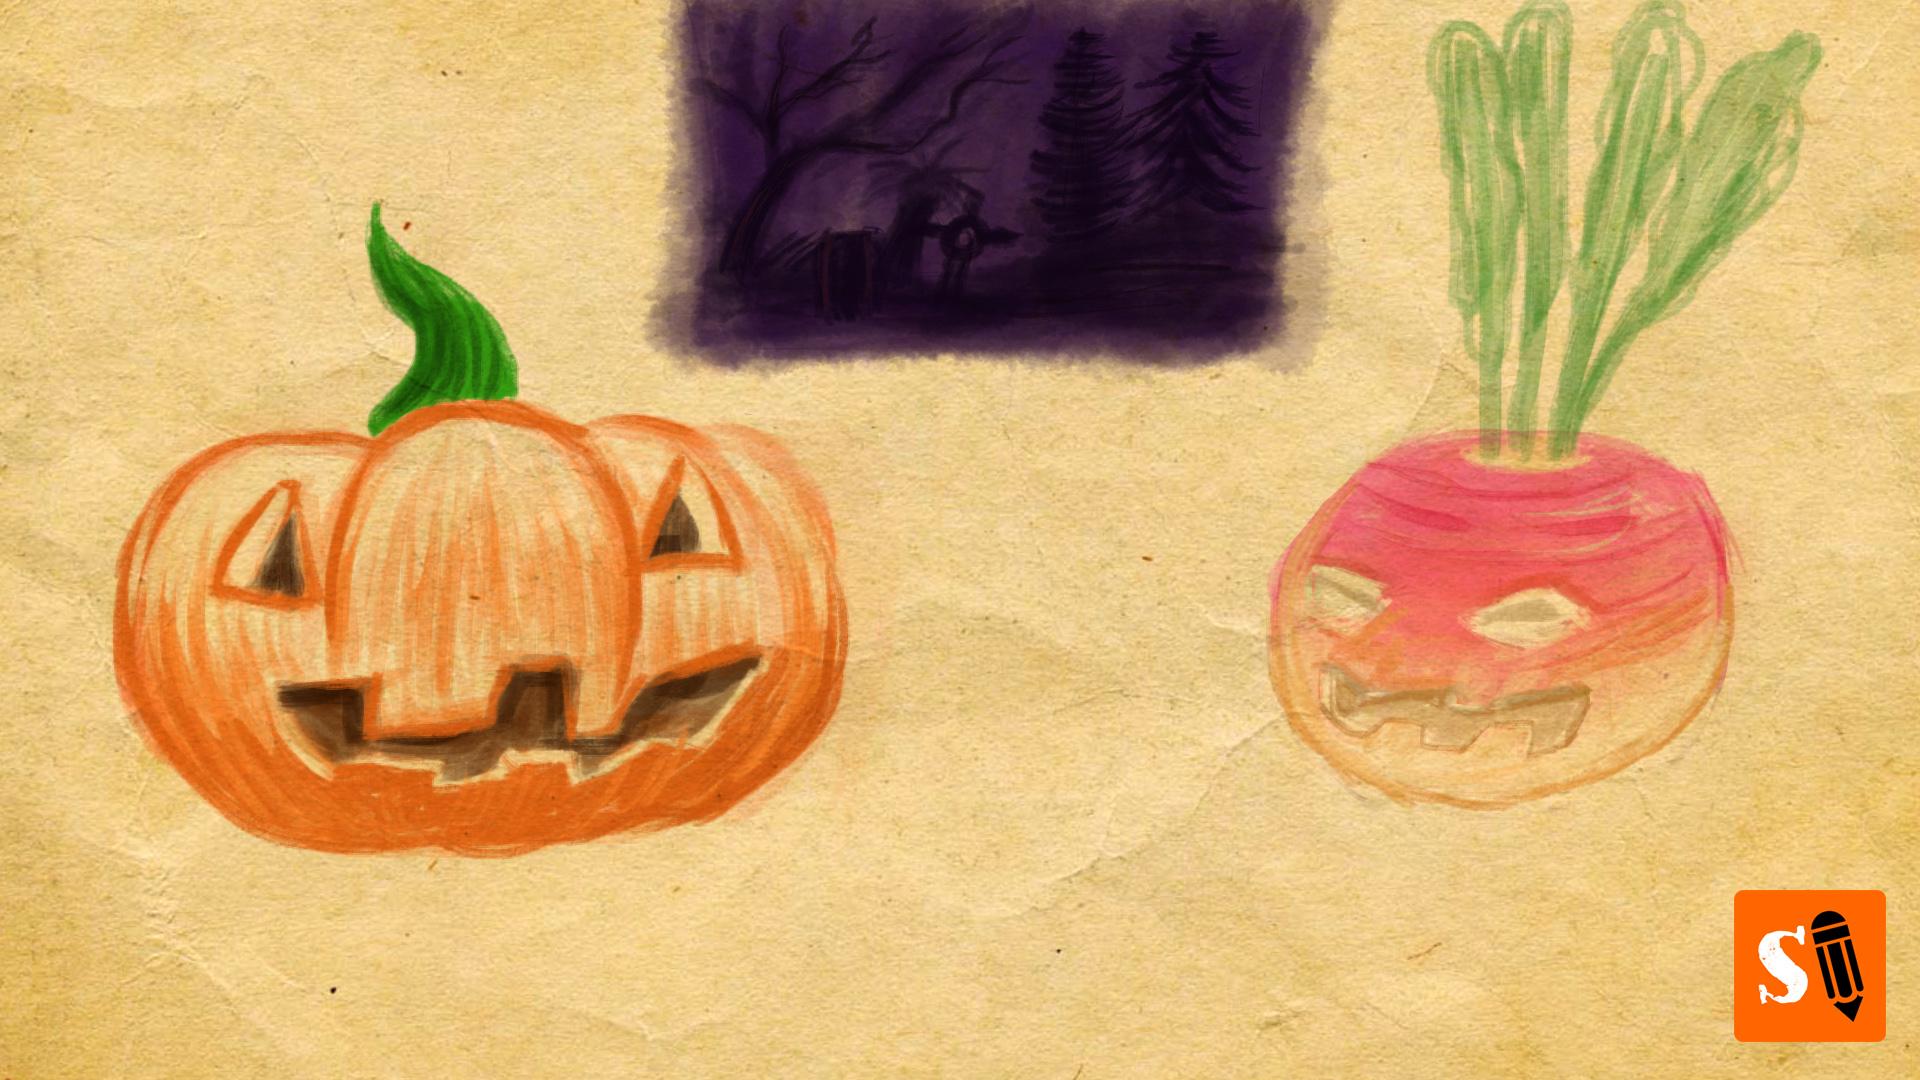 StayfDraws-Pumpkin-will_whisp